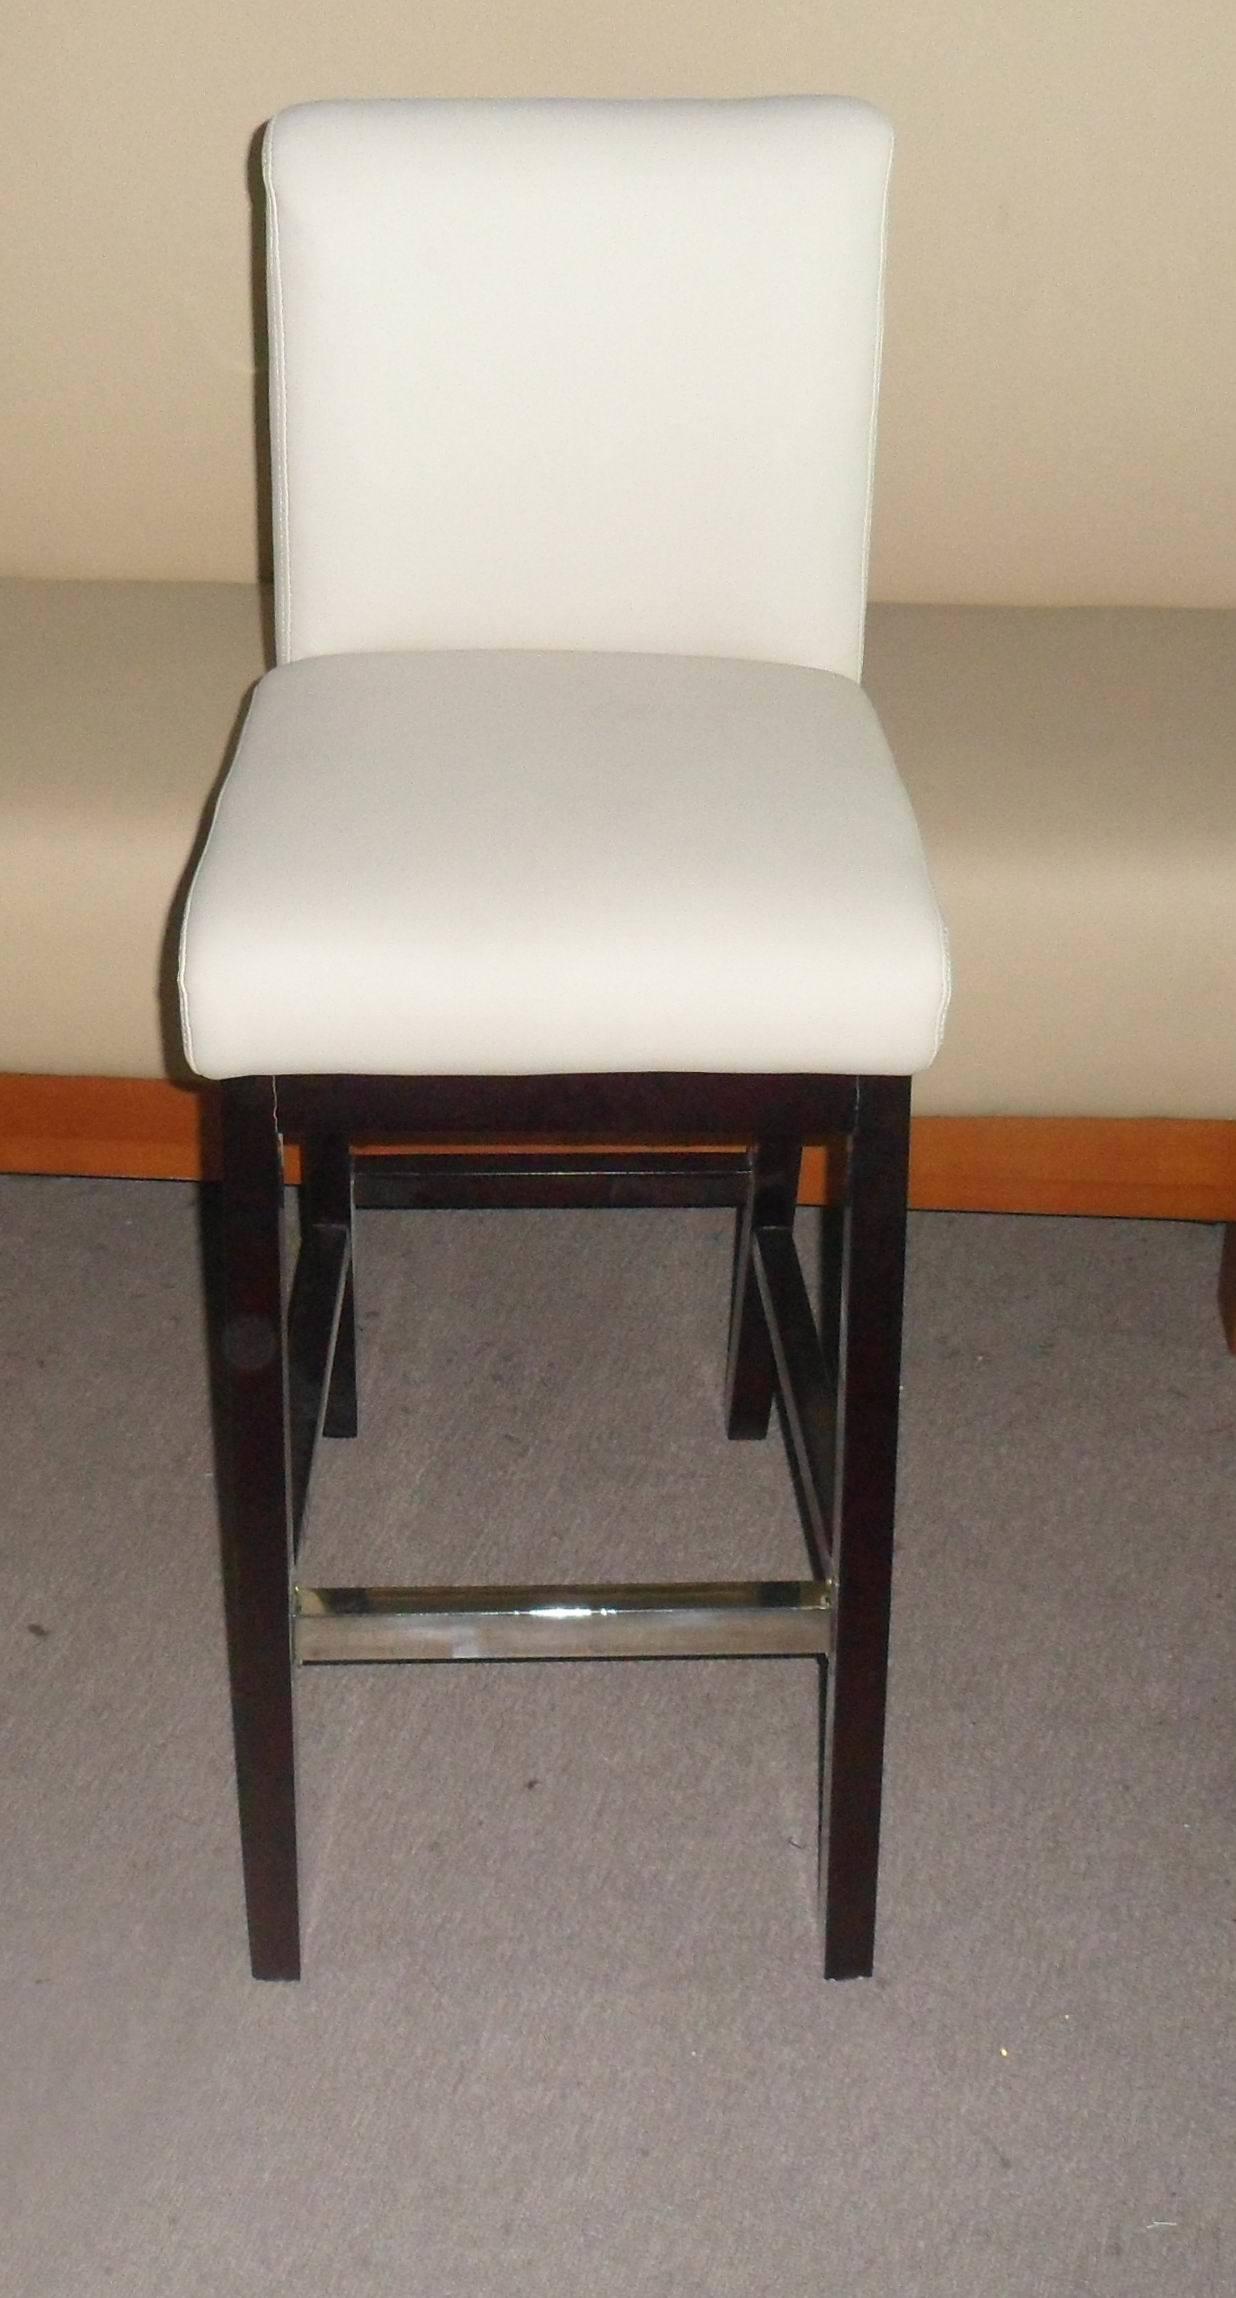 Sushi Dining Chair Bar Stool (DC-009)